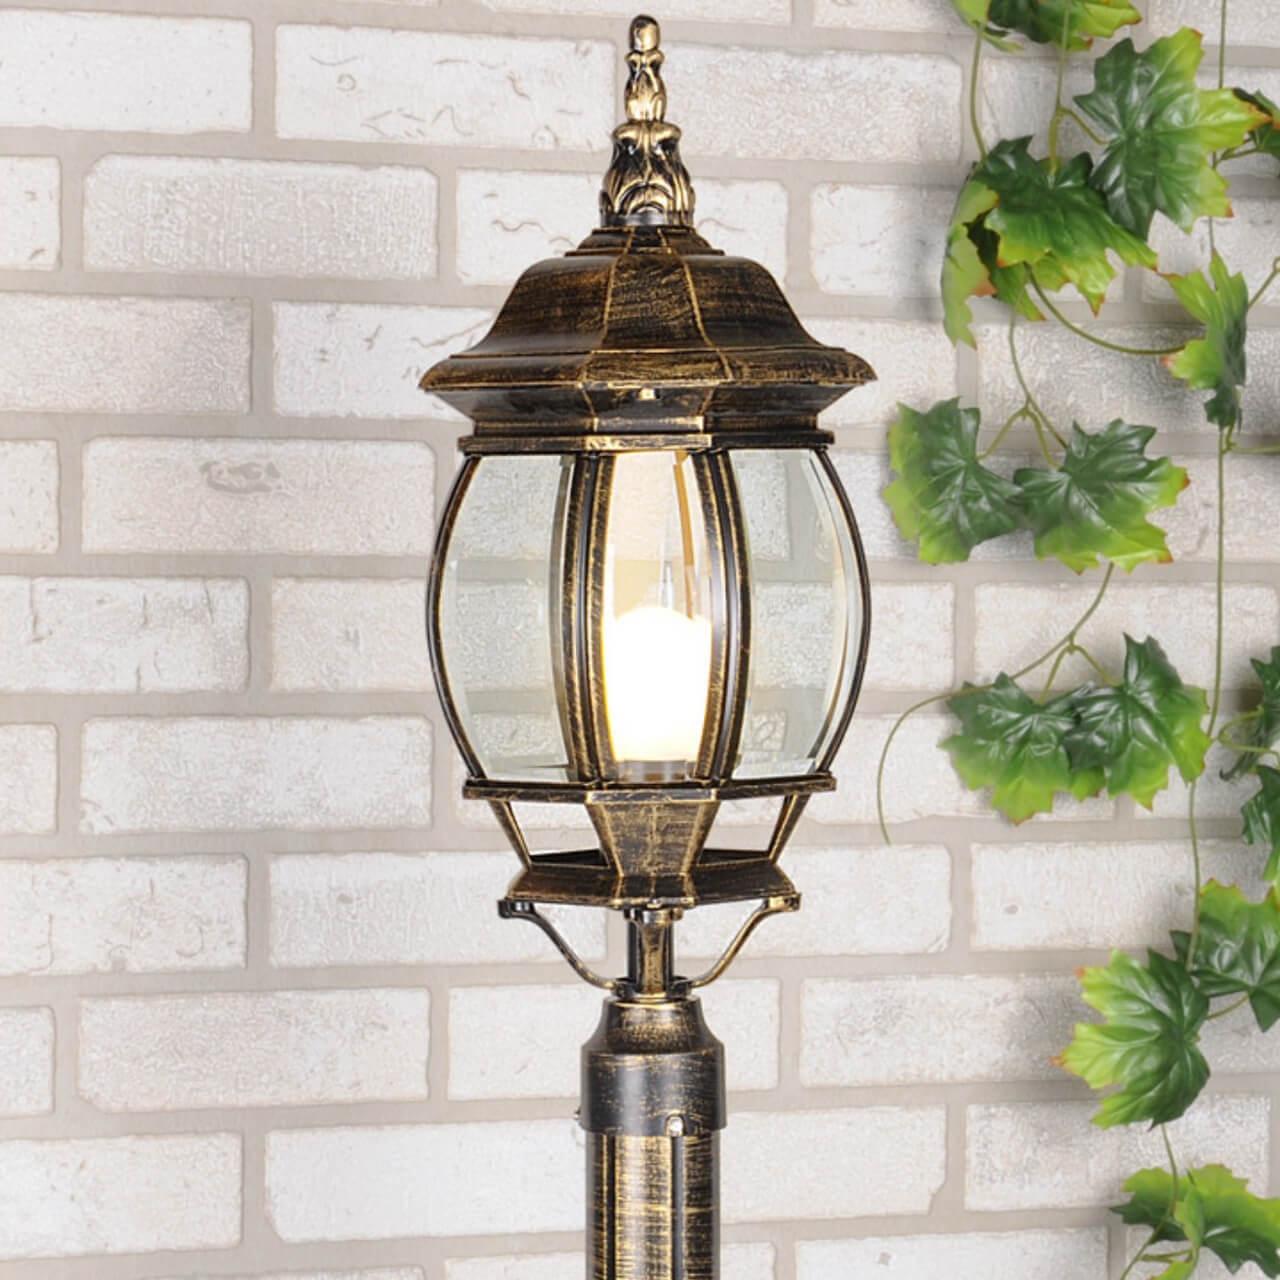 Уличный светильник Elektrostandard Els 1043 4607176195606 цены онлайн